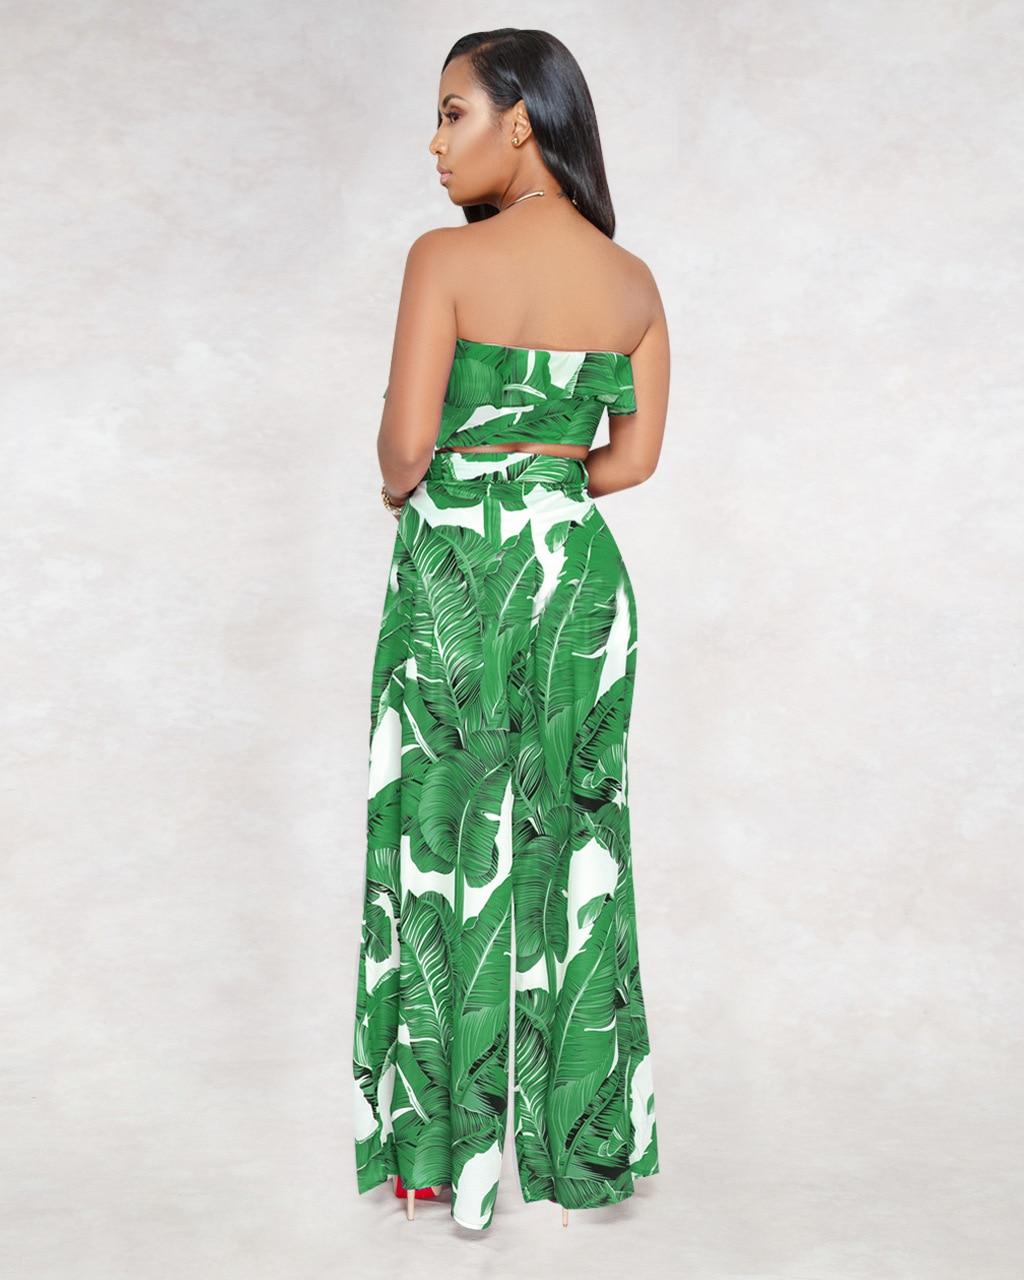 04c2b02ef0a Strapless Backless Sexy Jumpsuit Clubwear Women Summer Palm Leaf ...